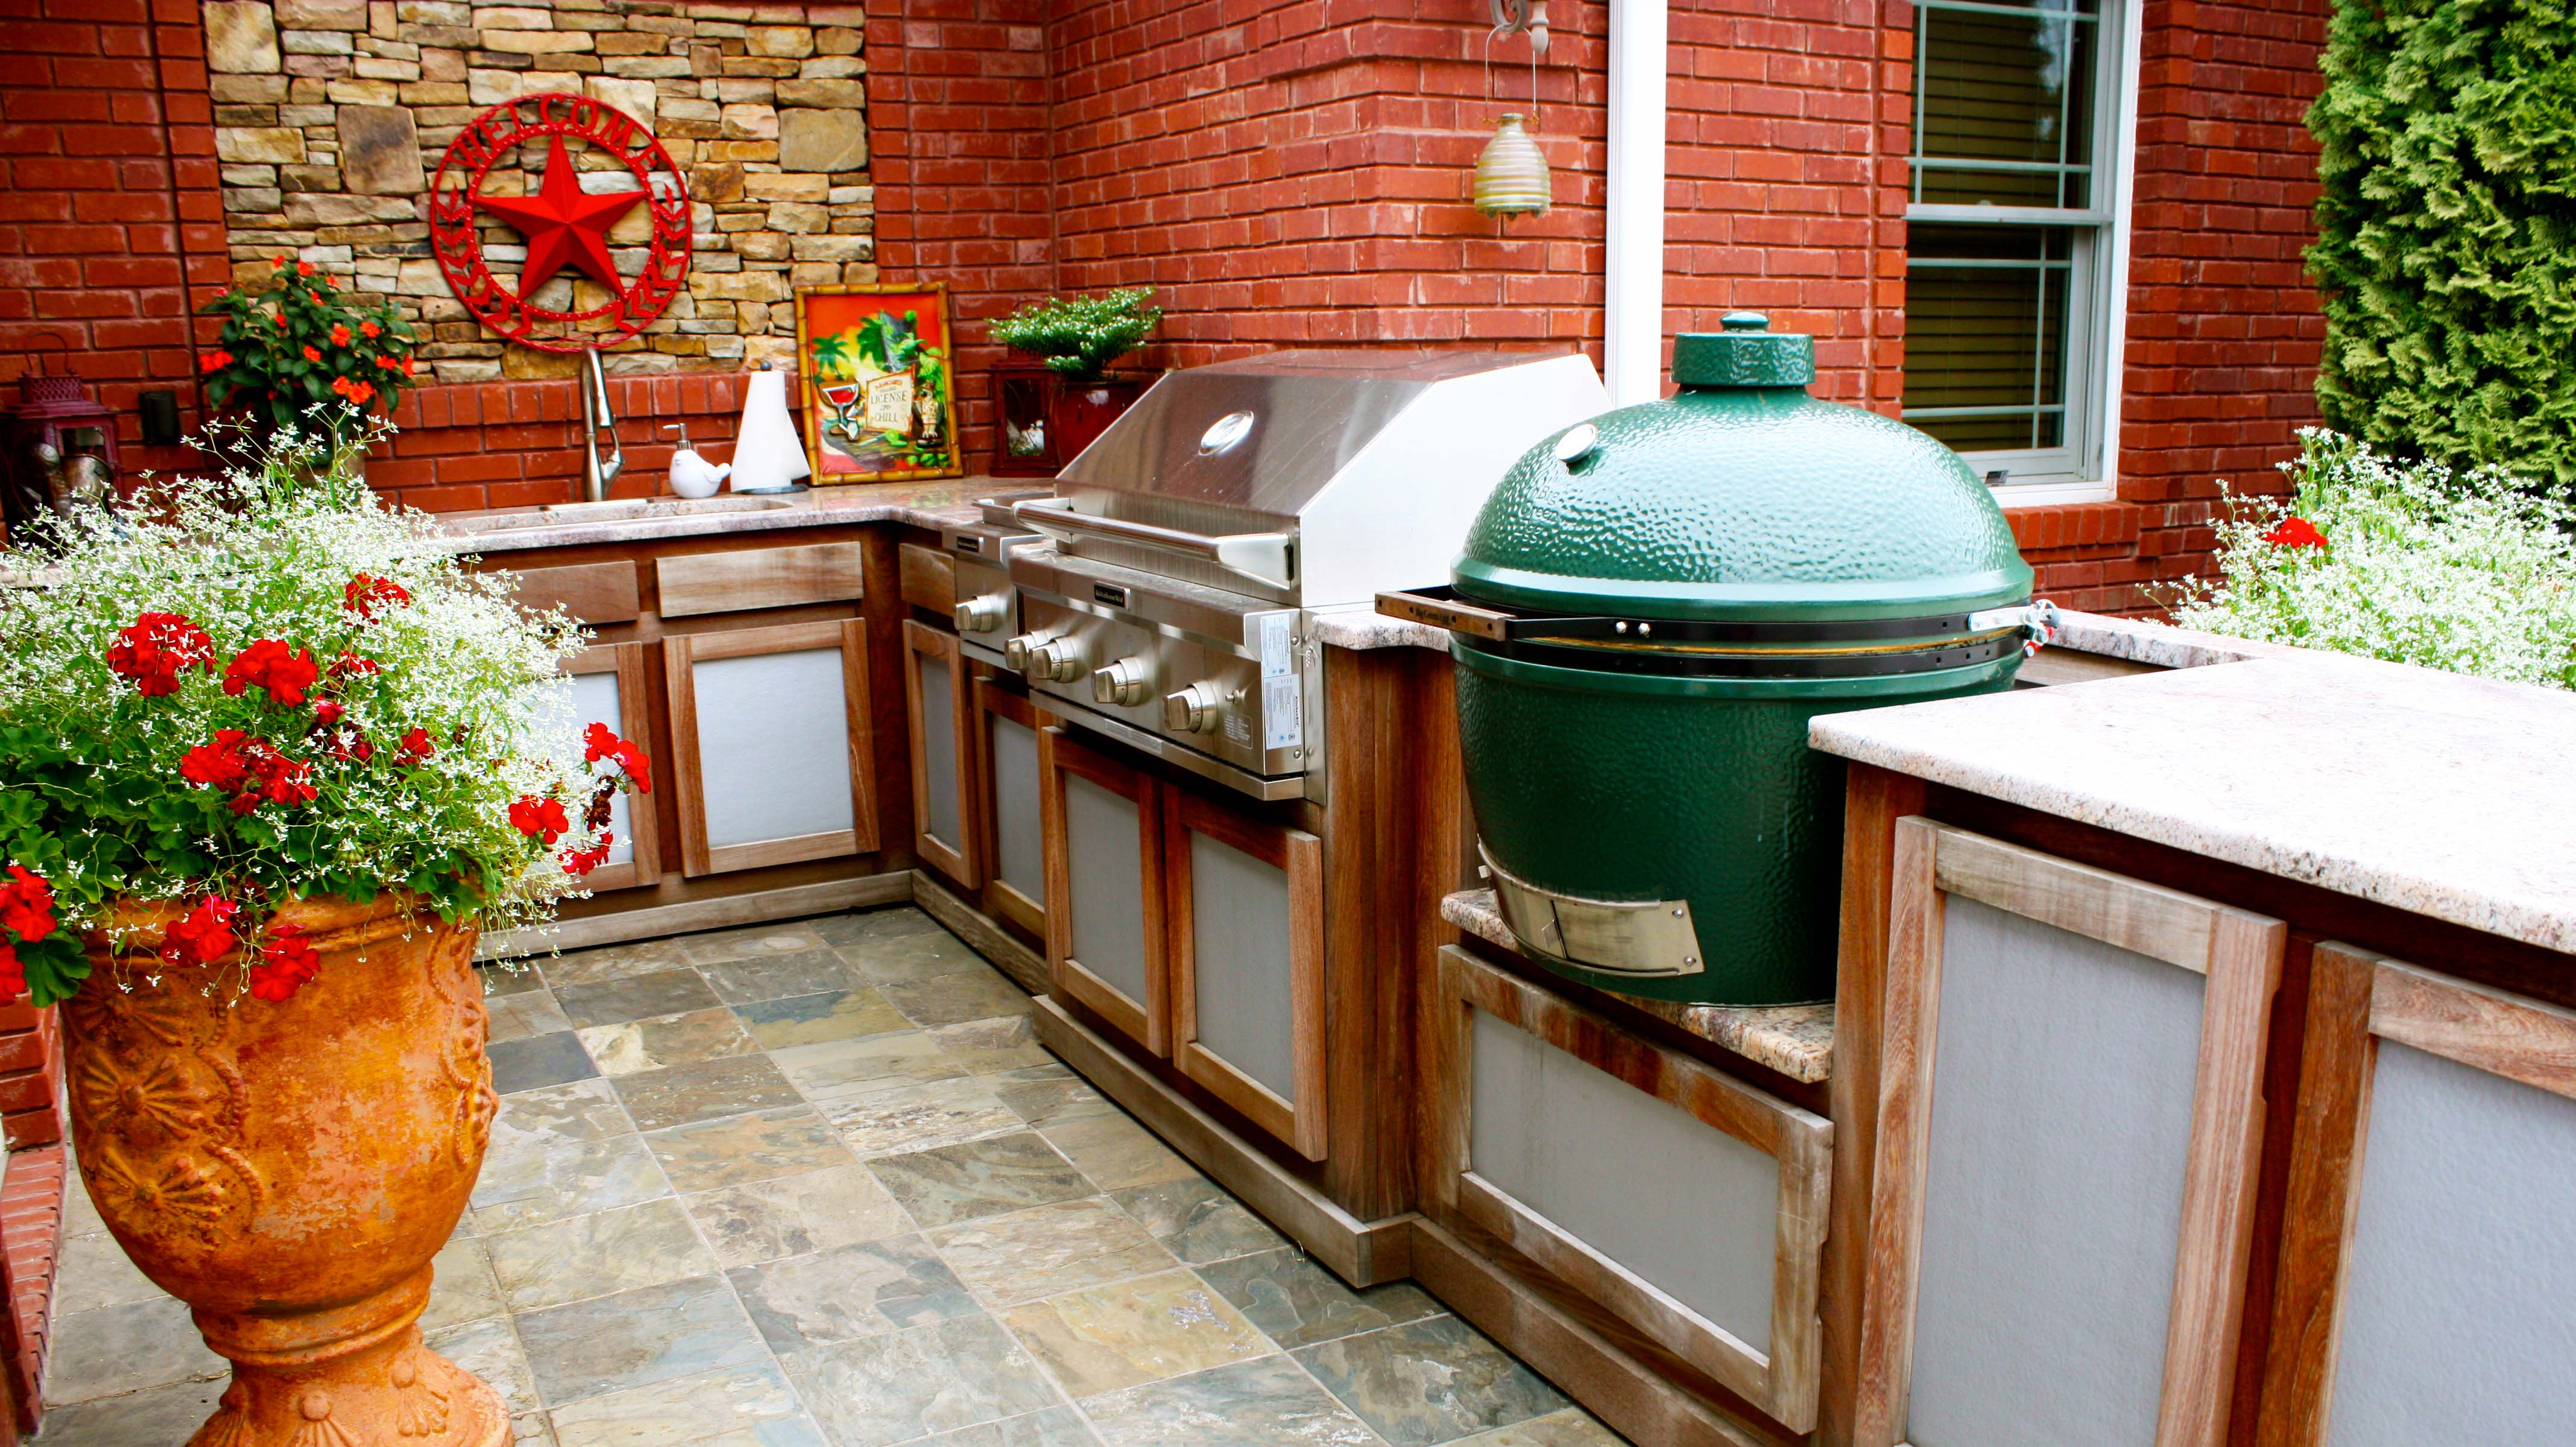 Best Backyard Kitchen Designs | Roy Home Design on Built In Grill Backyard id=92213